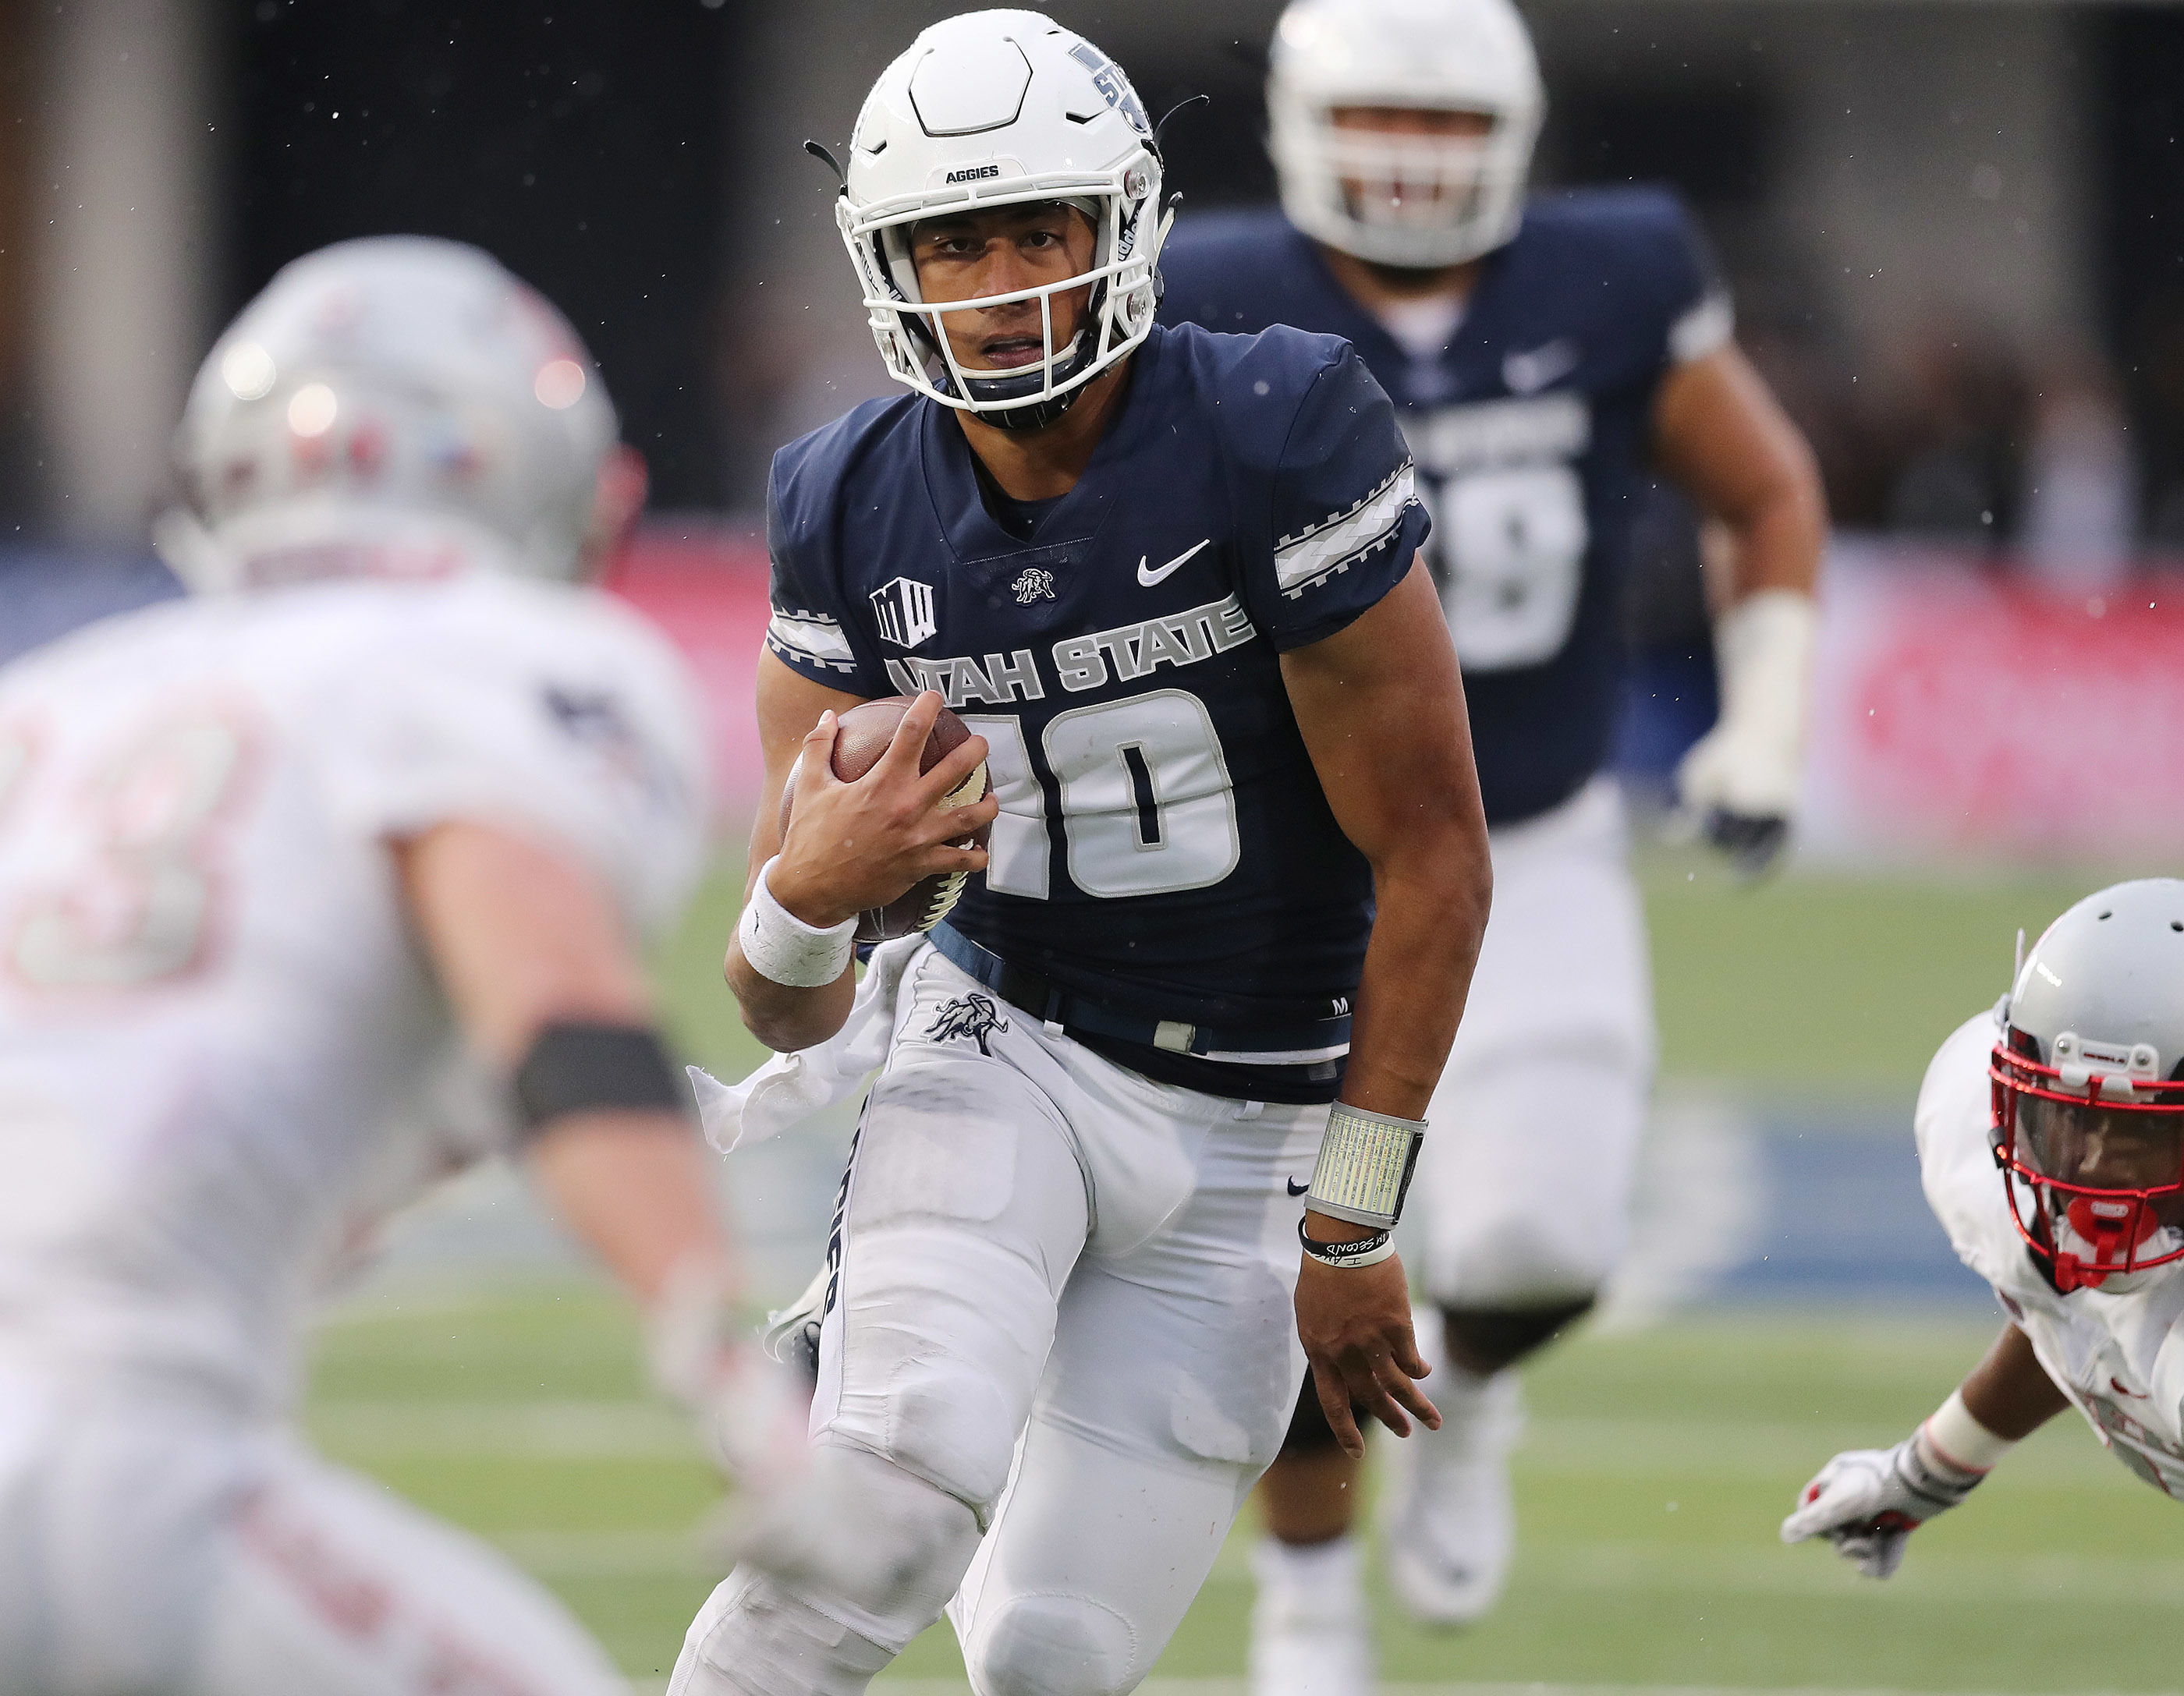 Utah State Aggies quarterback Jordan Love runs against UNLV in Logan on Saturday, Oct. 13, 2018.